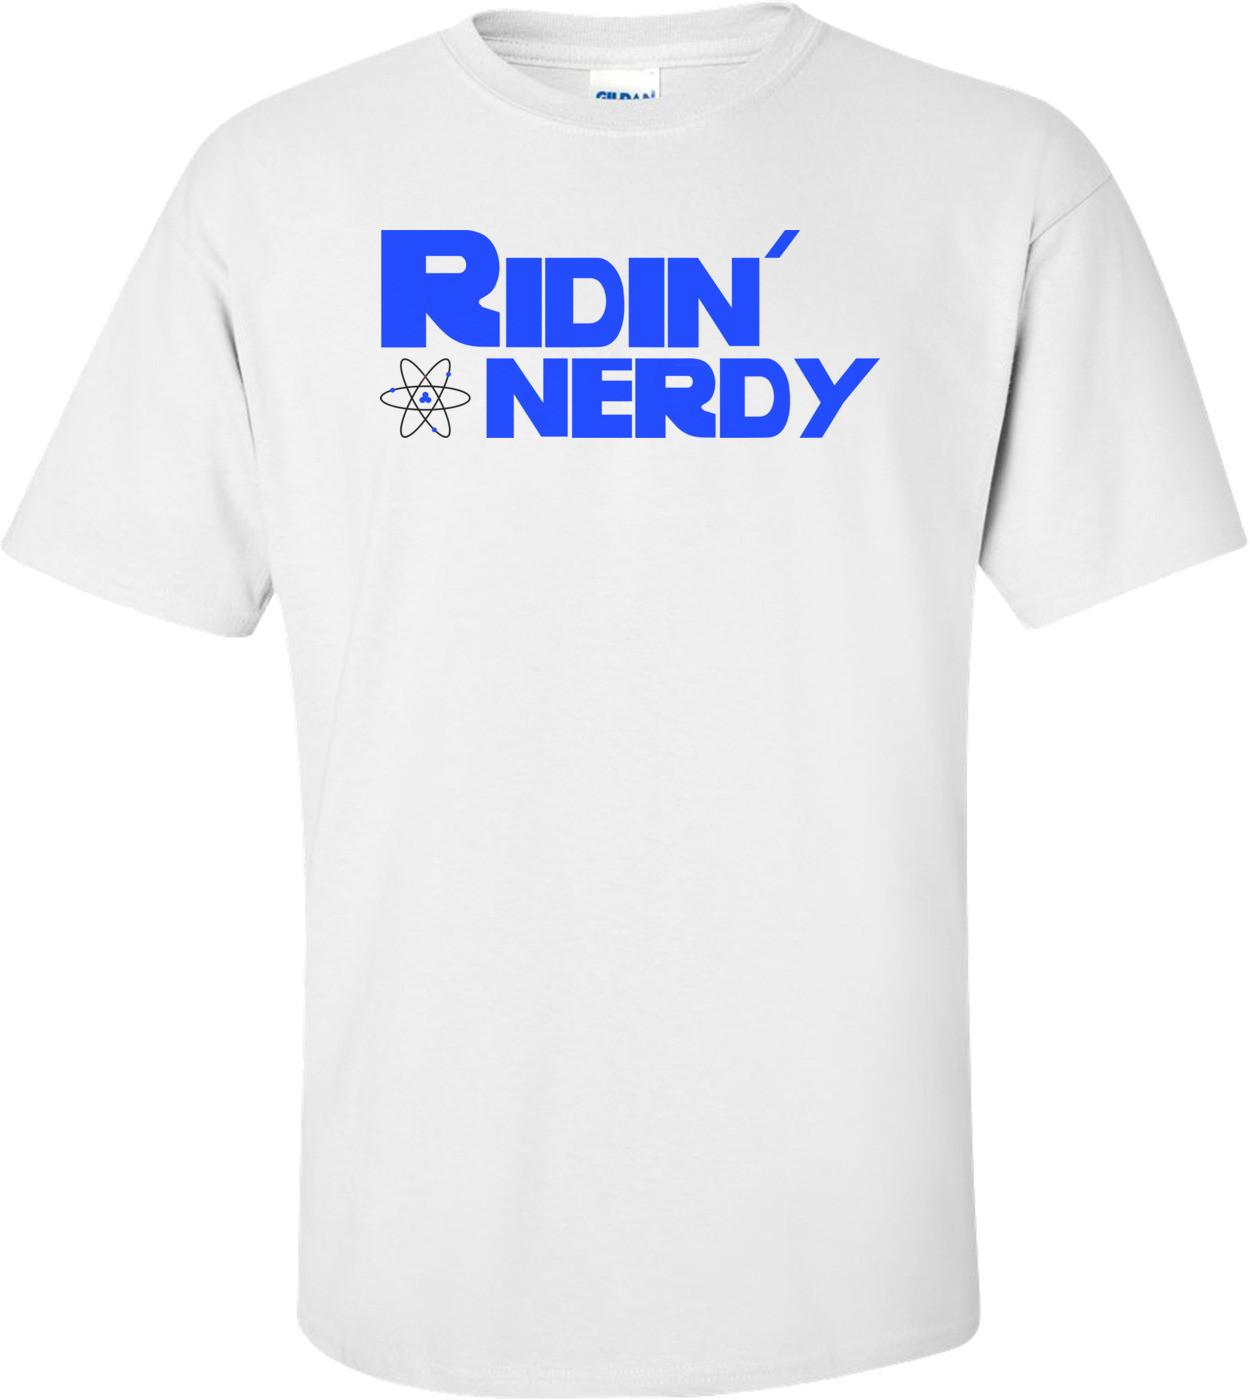 Ridin' Nerdy Funny Nerd Shirt